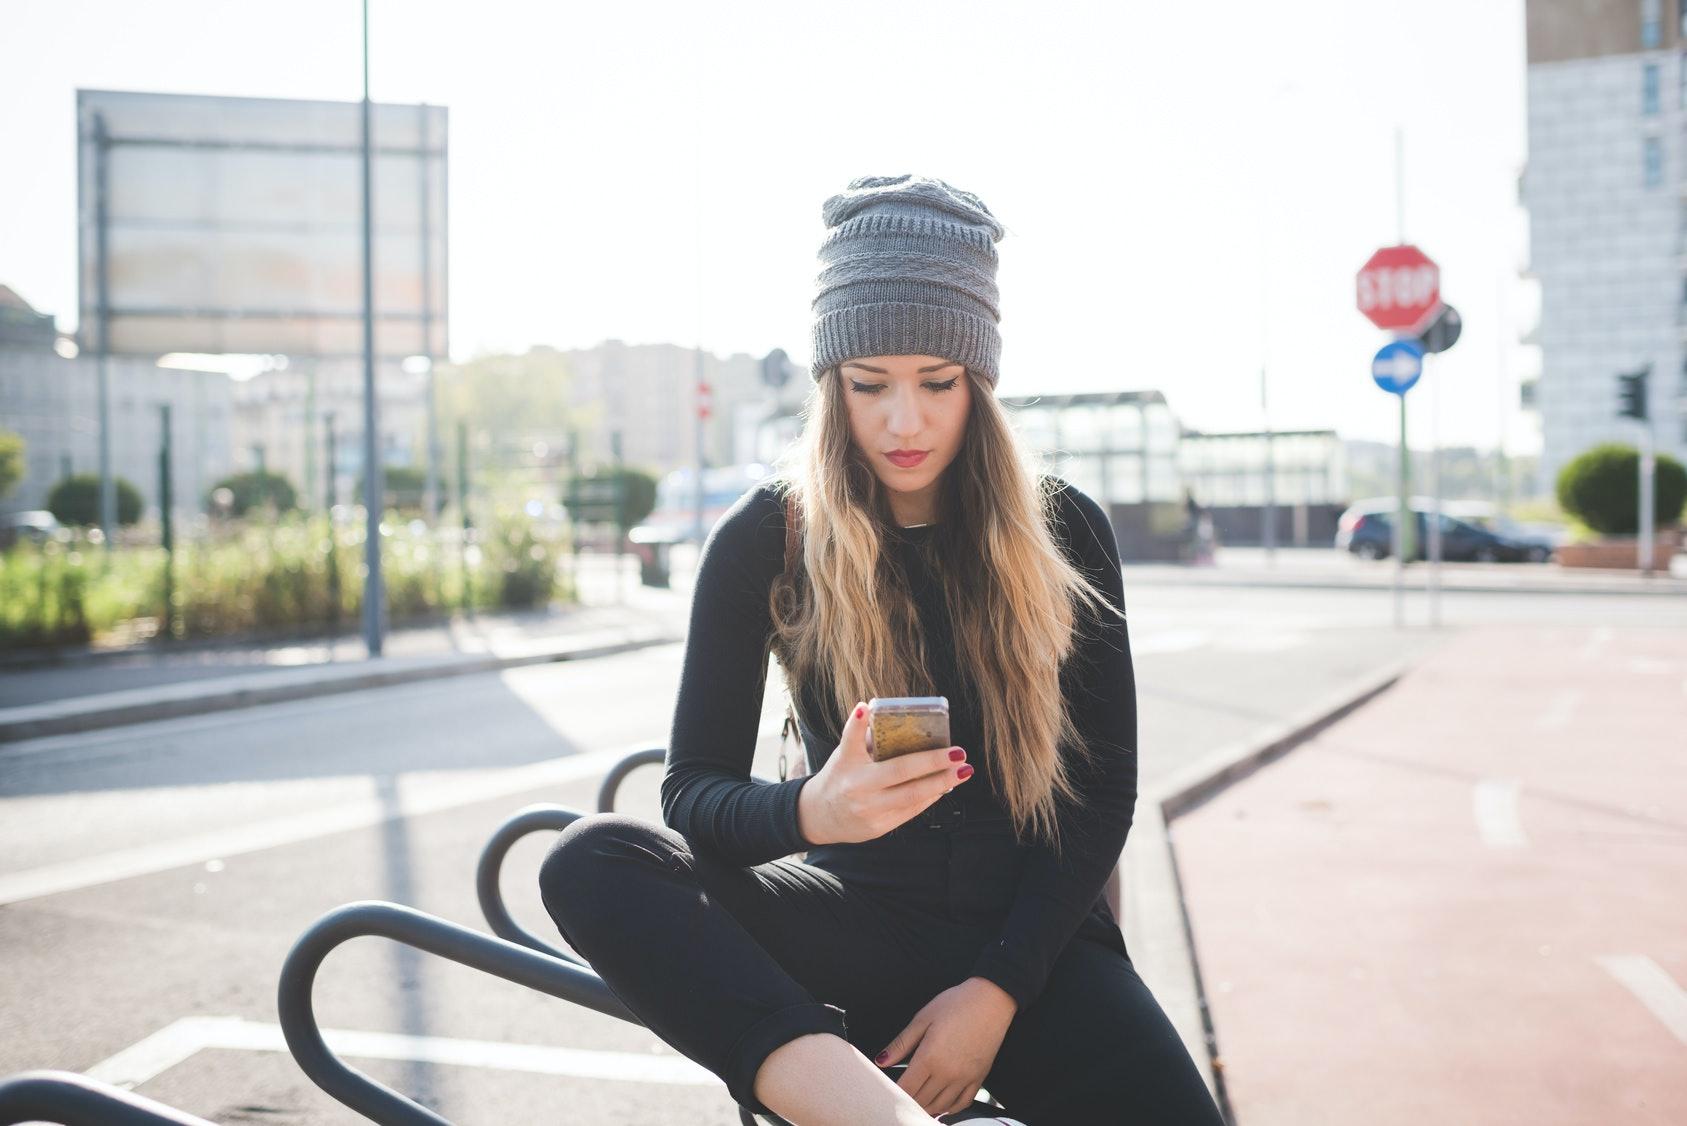 Strafregisterauszug online dating